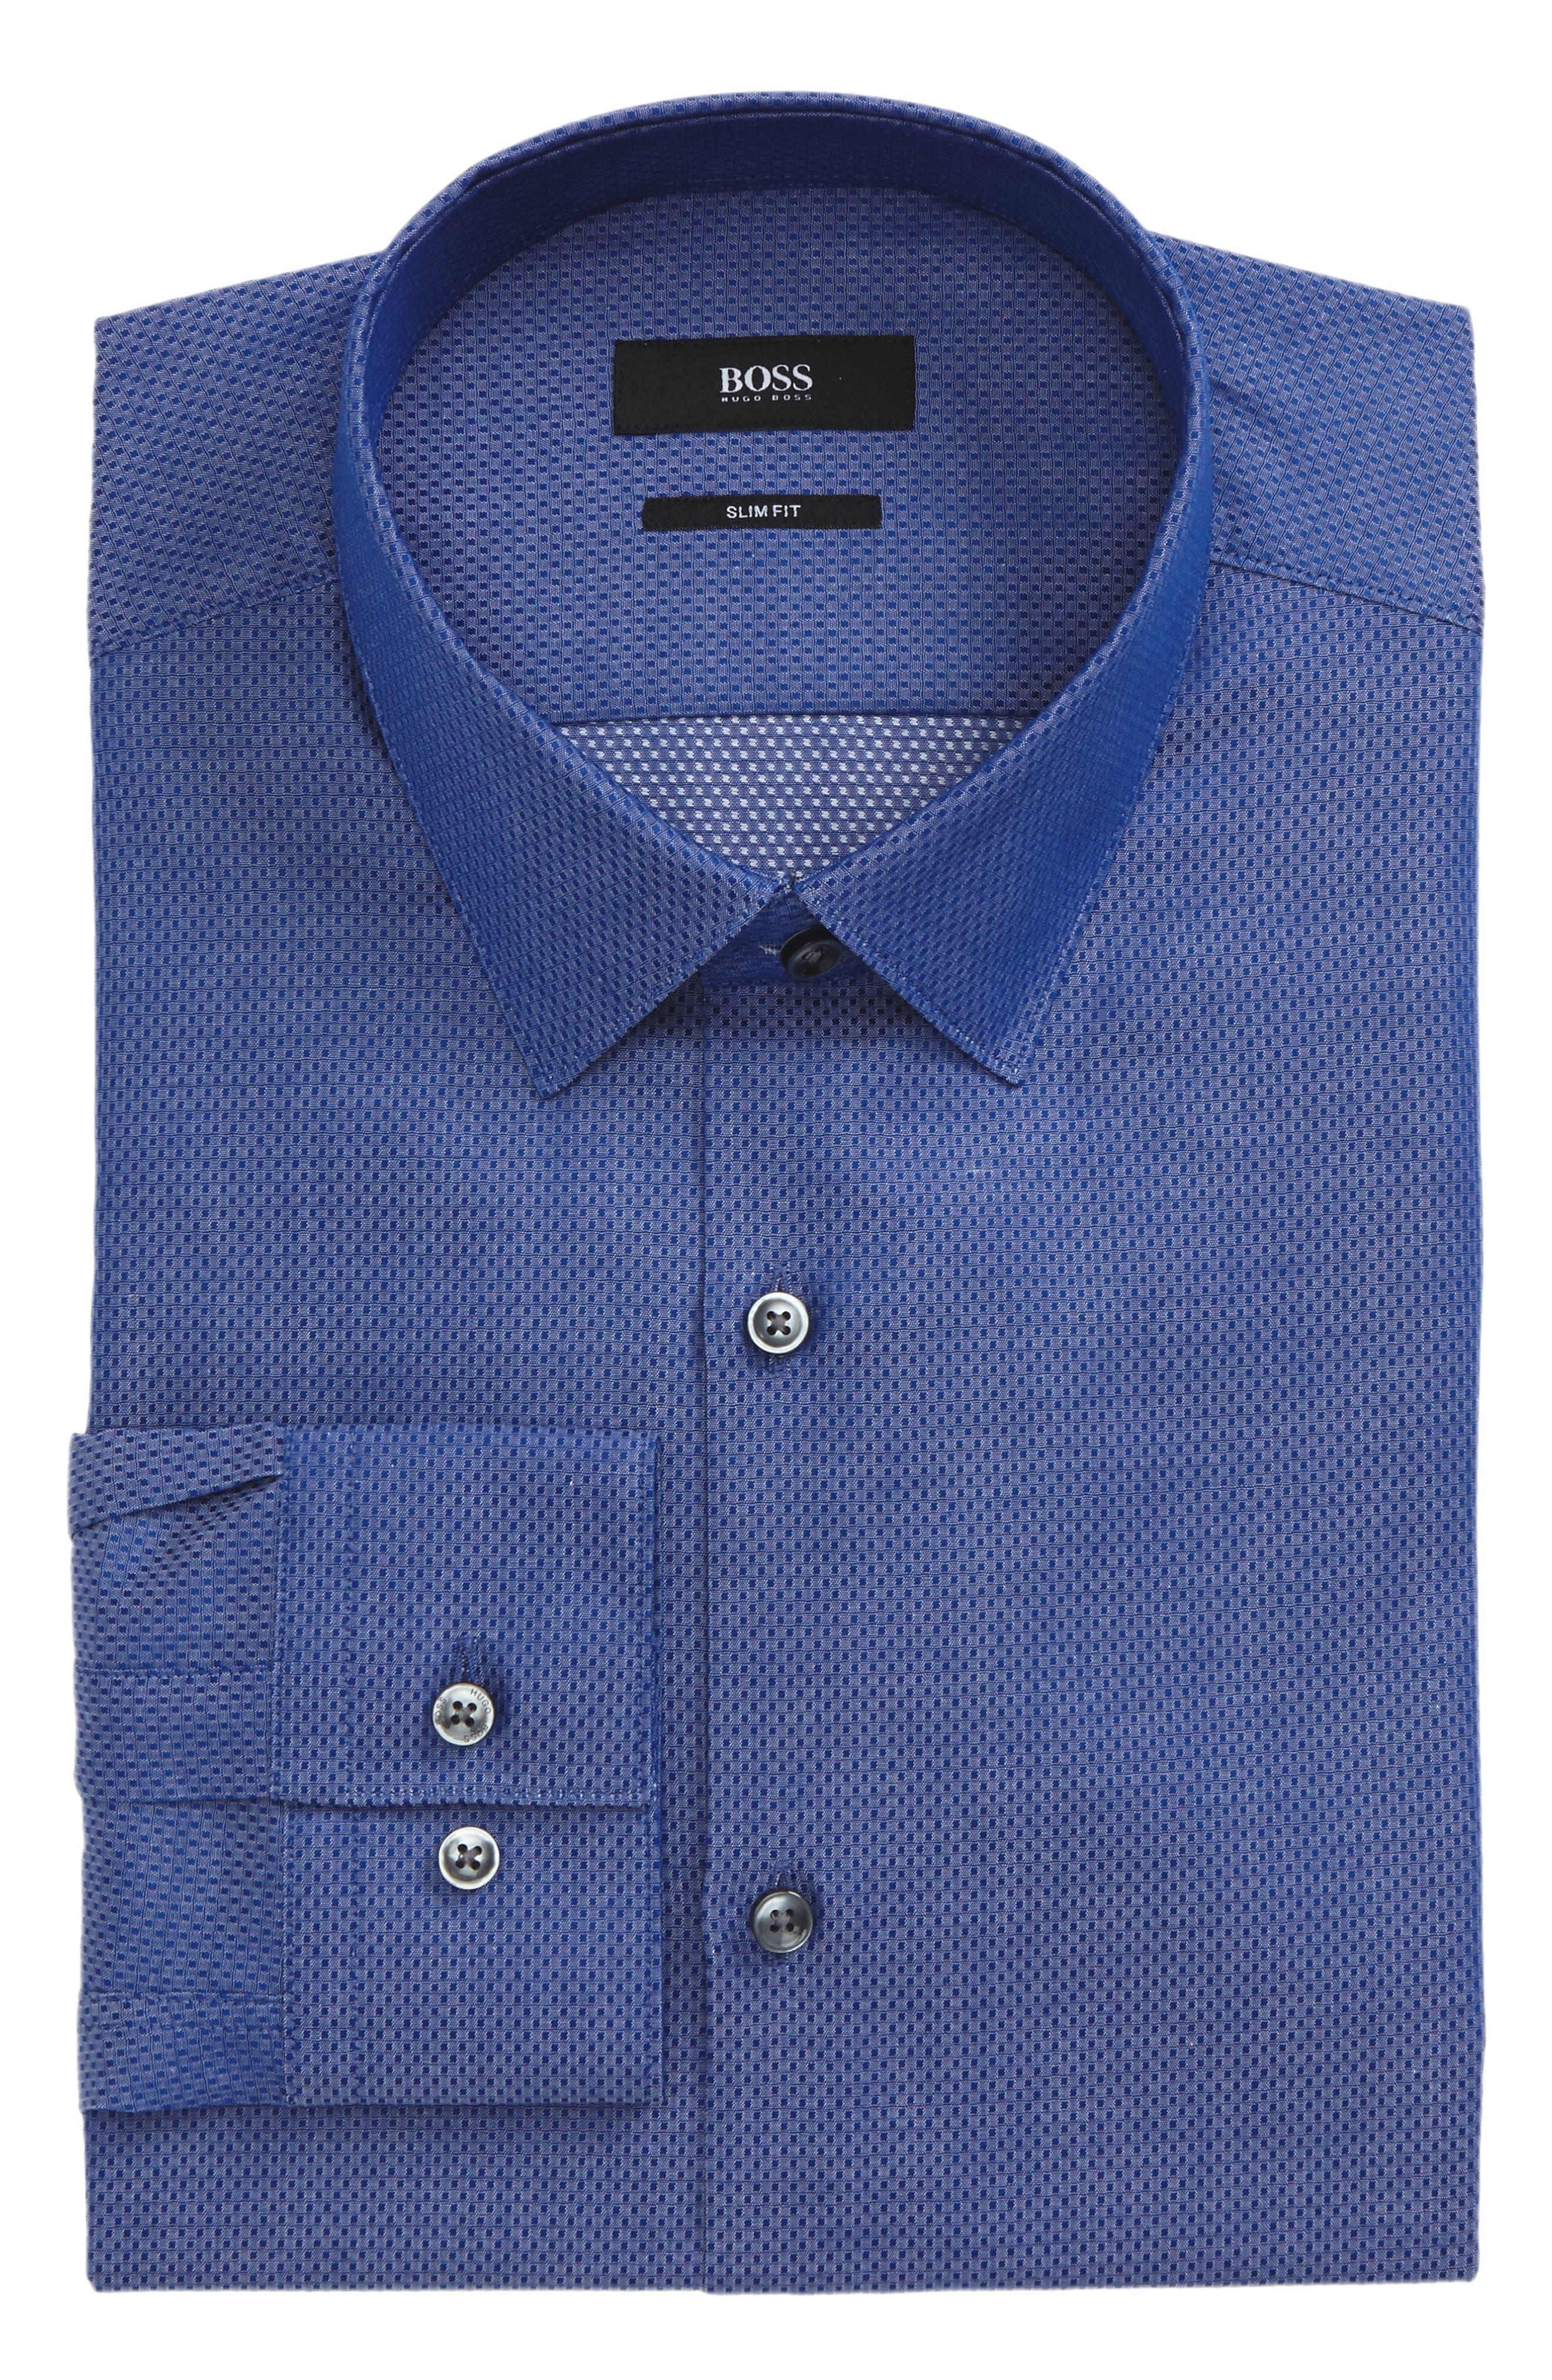 Main Image - BOSS Isko Slim Fit Textured Dress Shirt